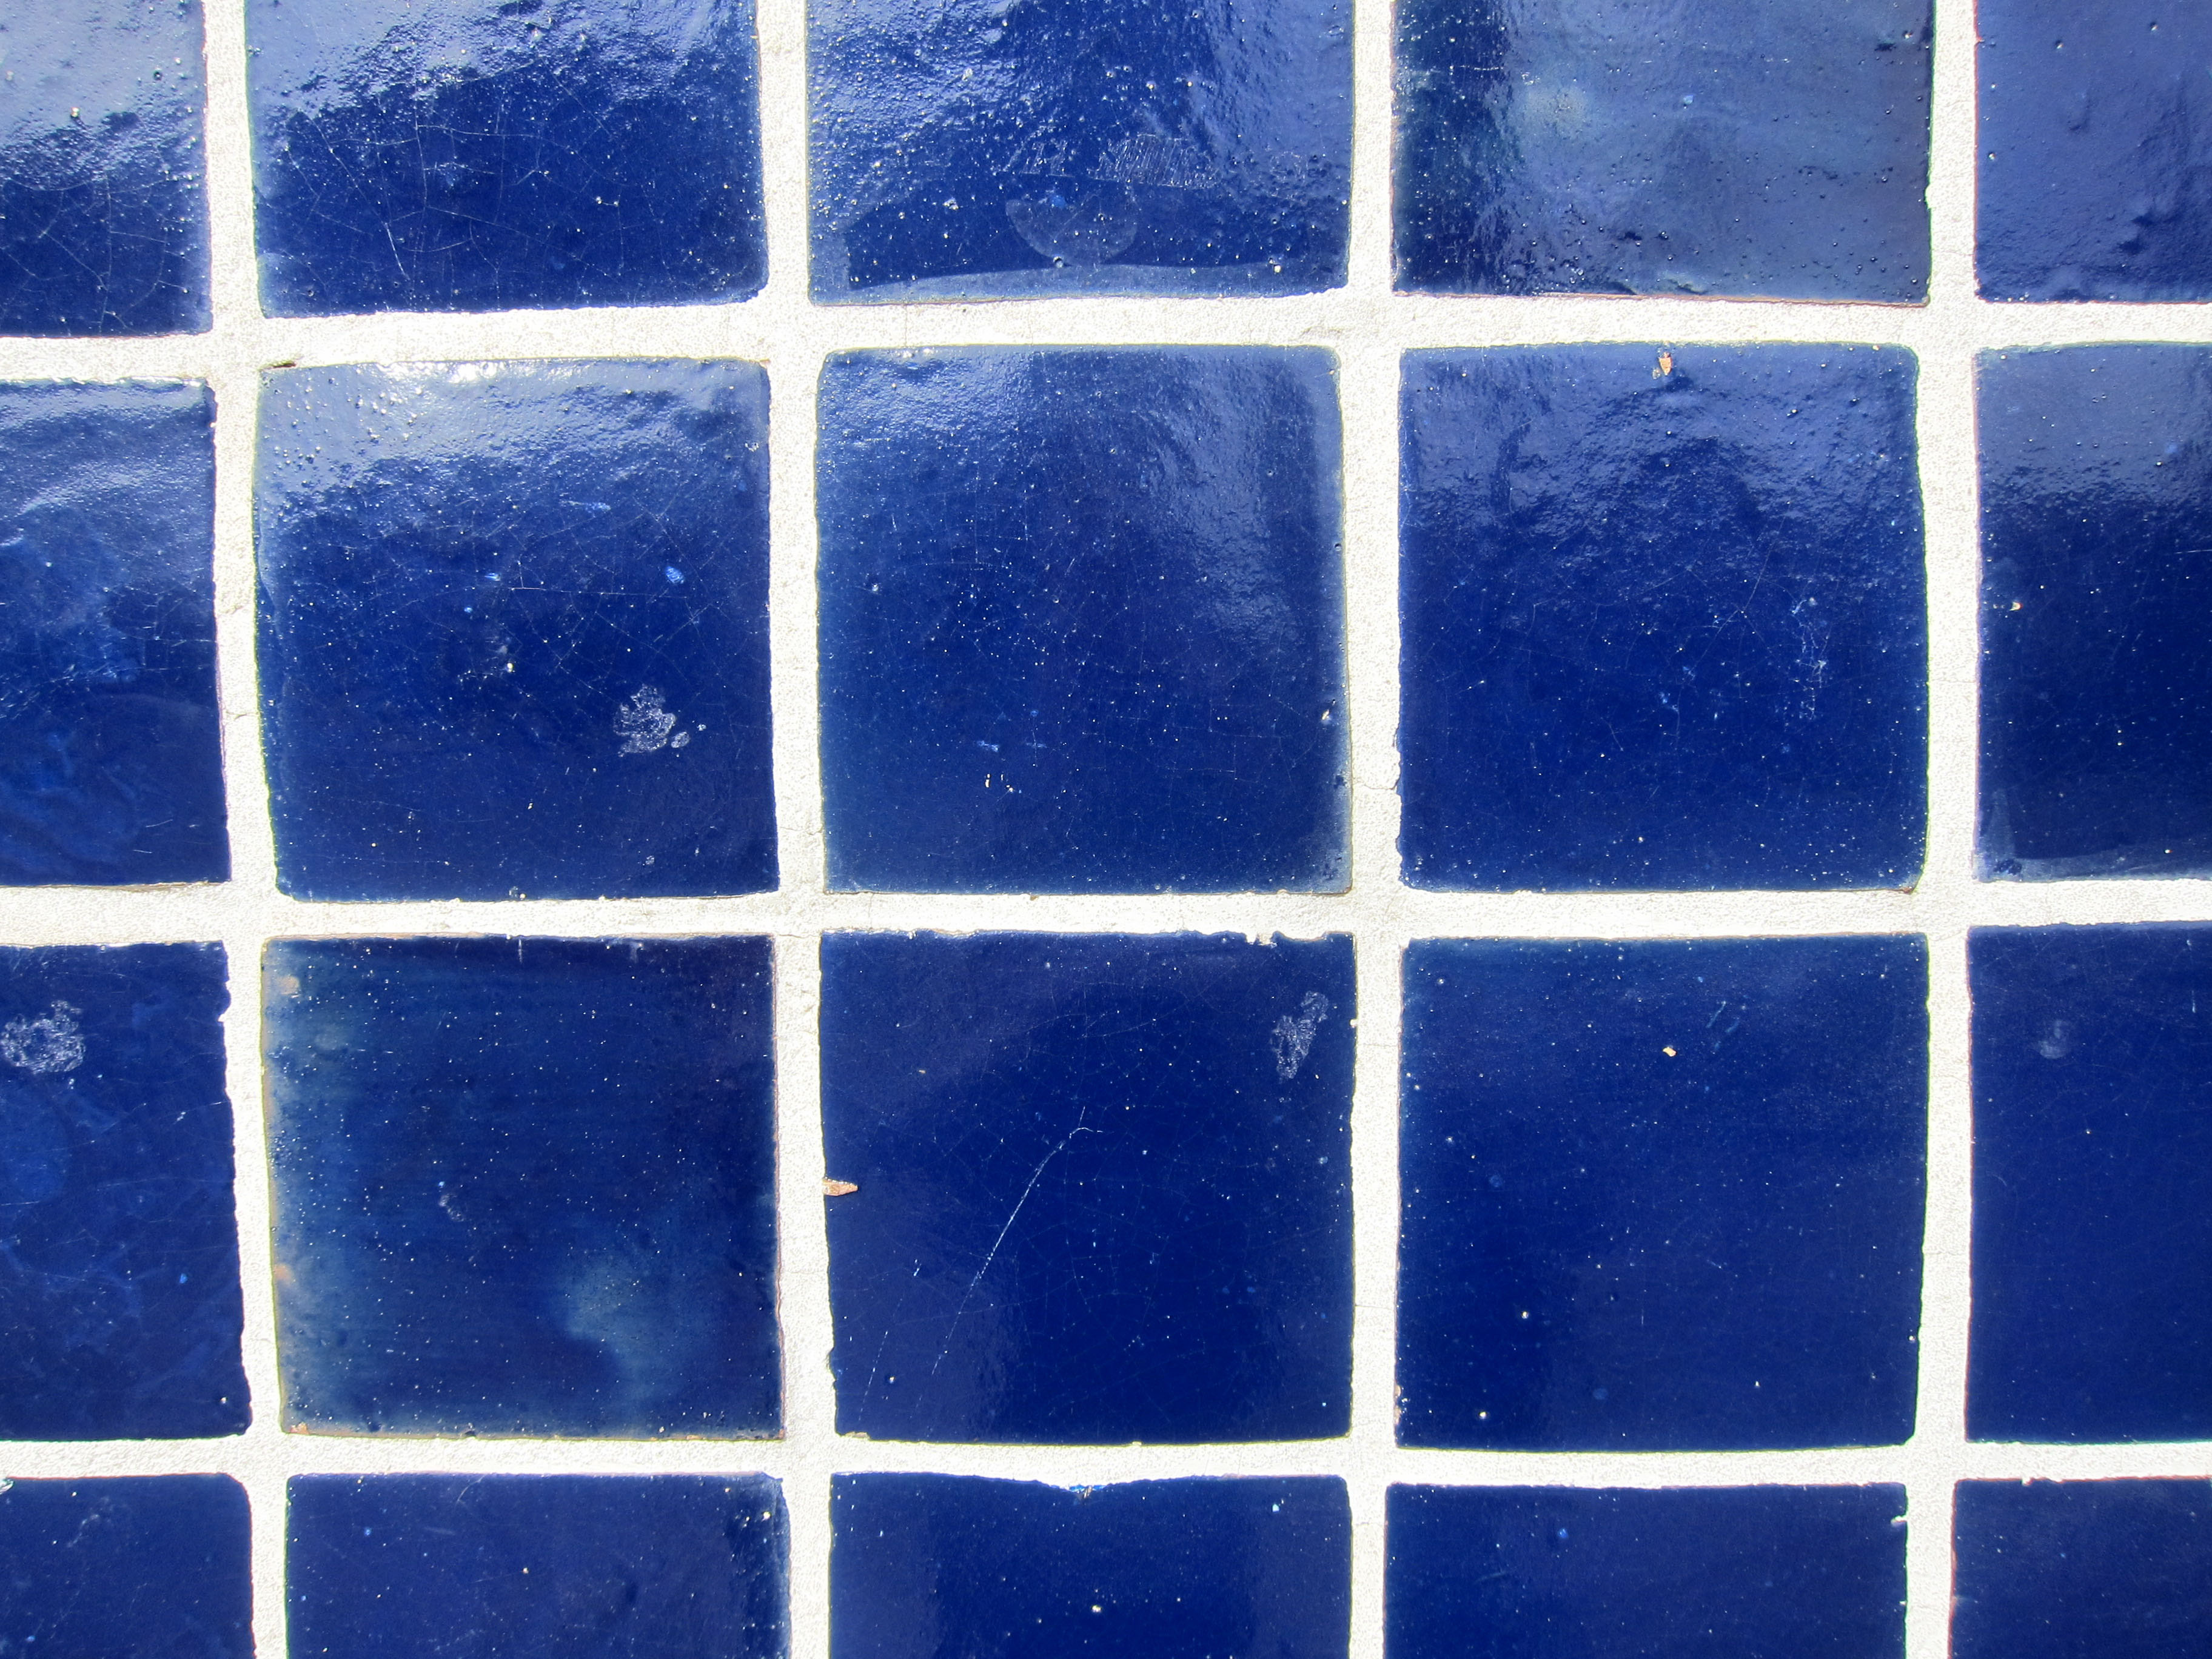 Bathroom Remodeling In San Antonio Tx 210 637 5050 Lonestar Tile And Grout Cleaning Llc